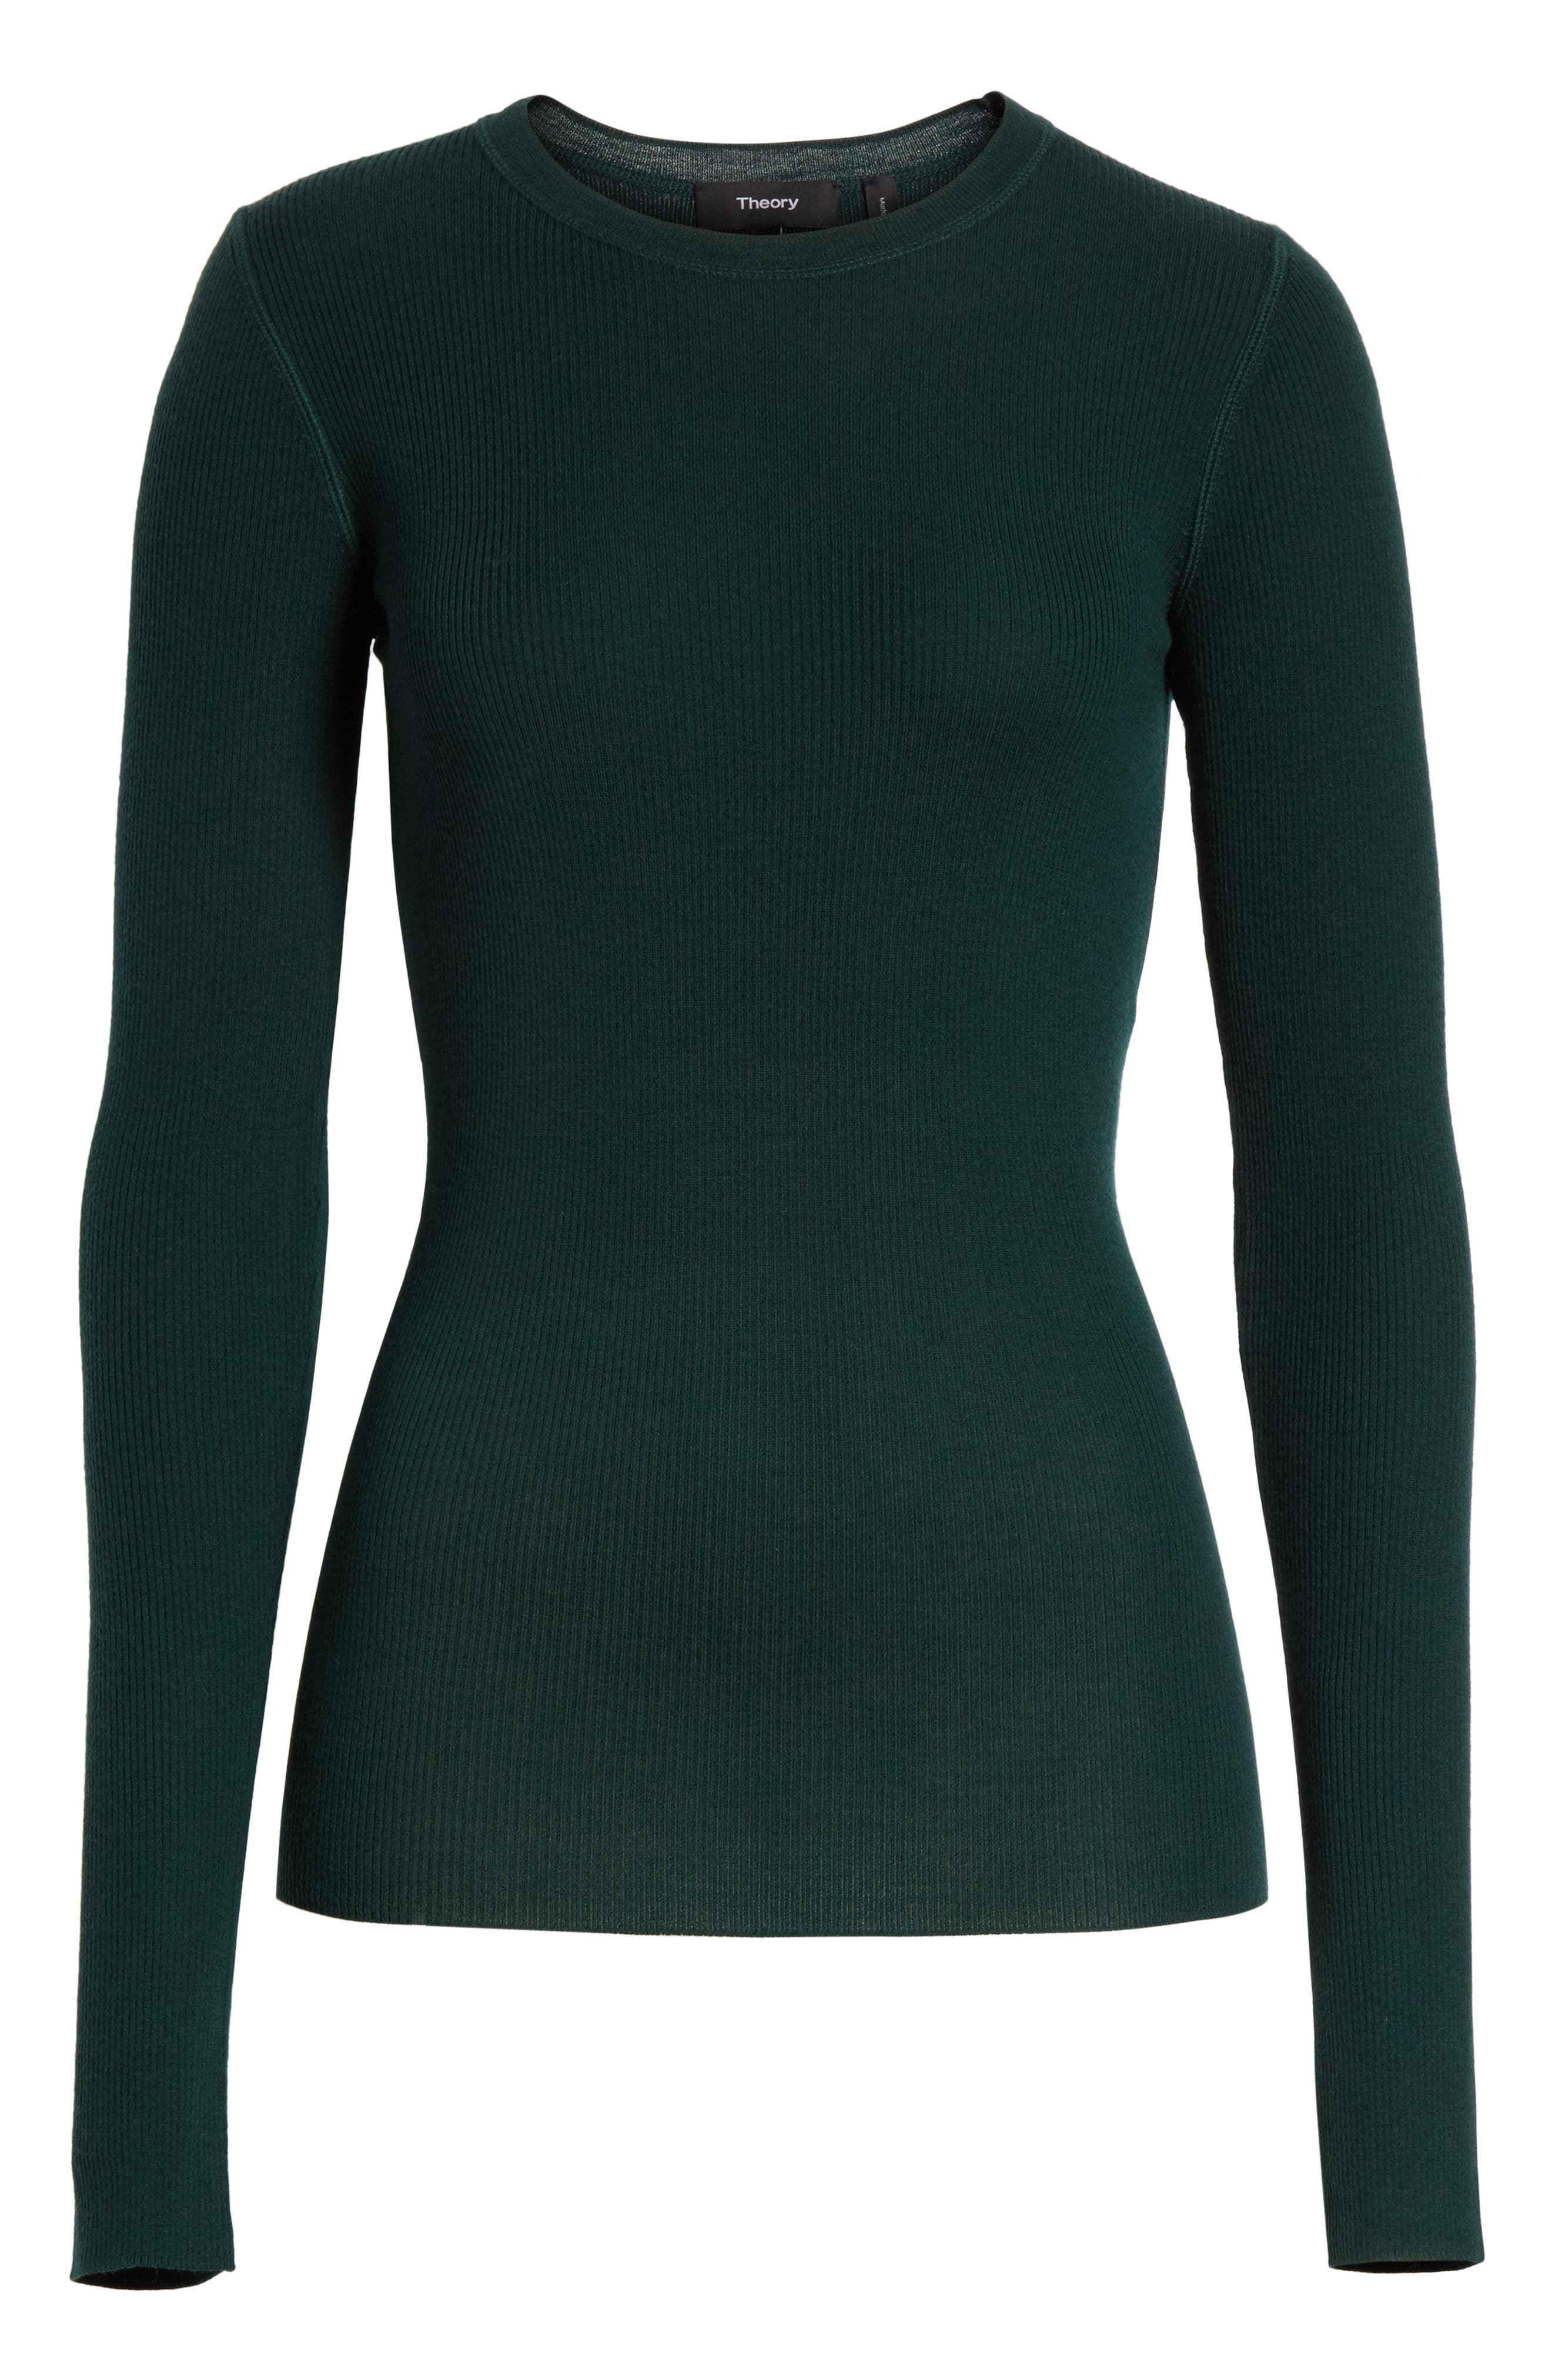 Mirzi Ribbed Sweater,                             Alternate thumbnail 6, color,                             308